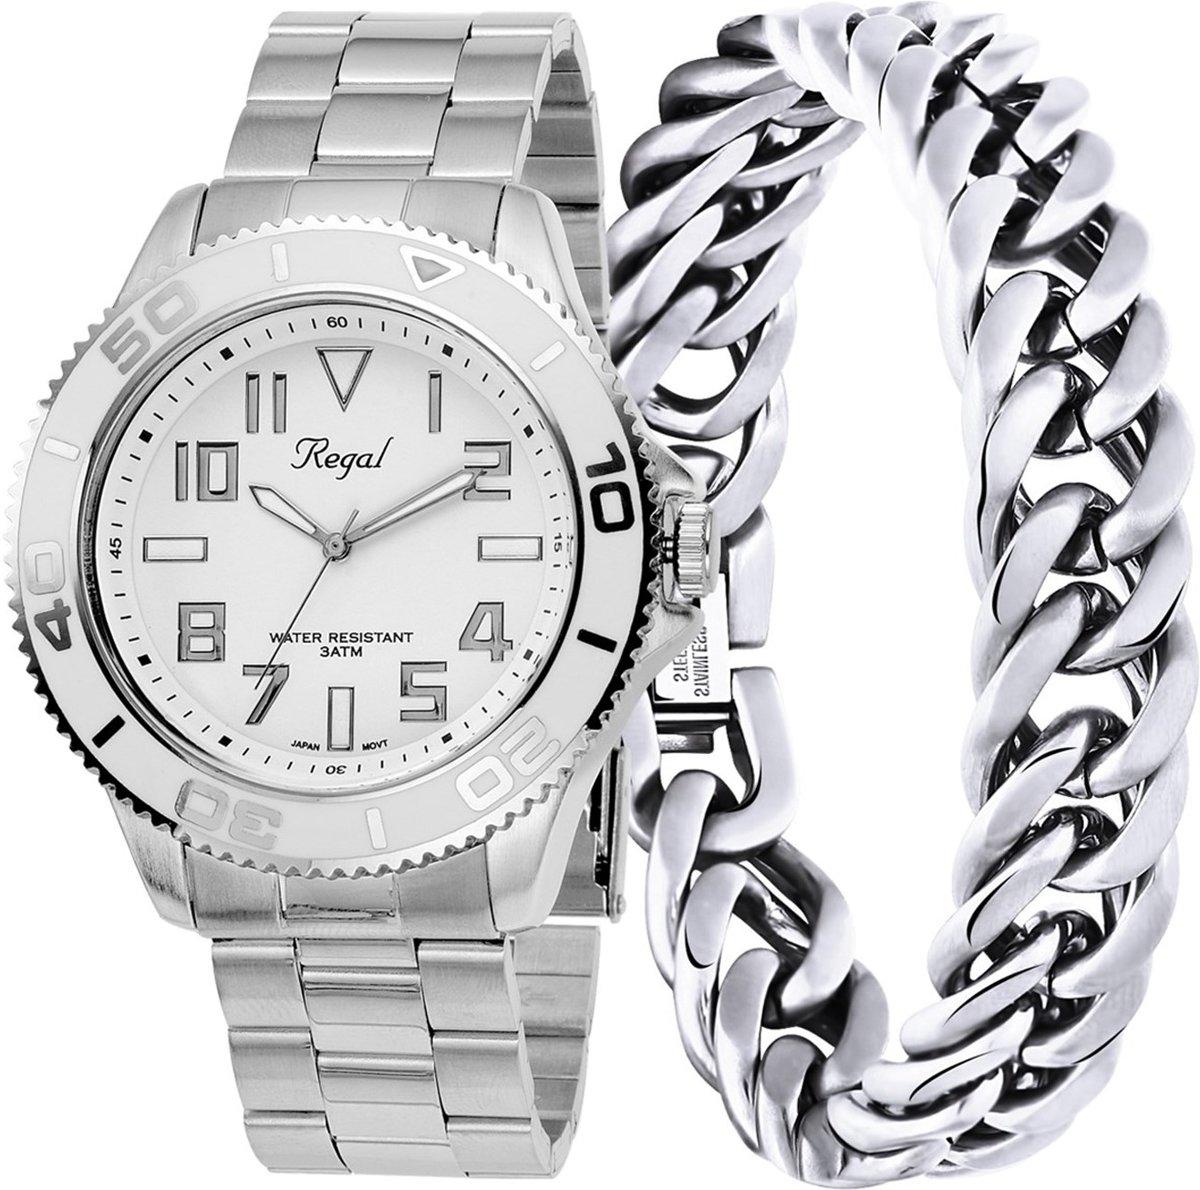 Lucardi - Stalen set armband & Regal horloge R14793-112 - maat 19 kopen